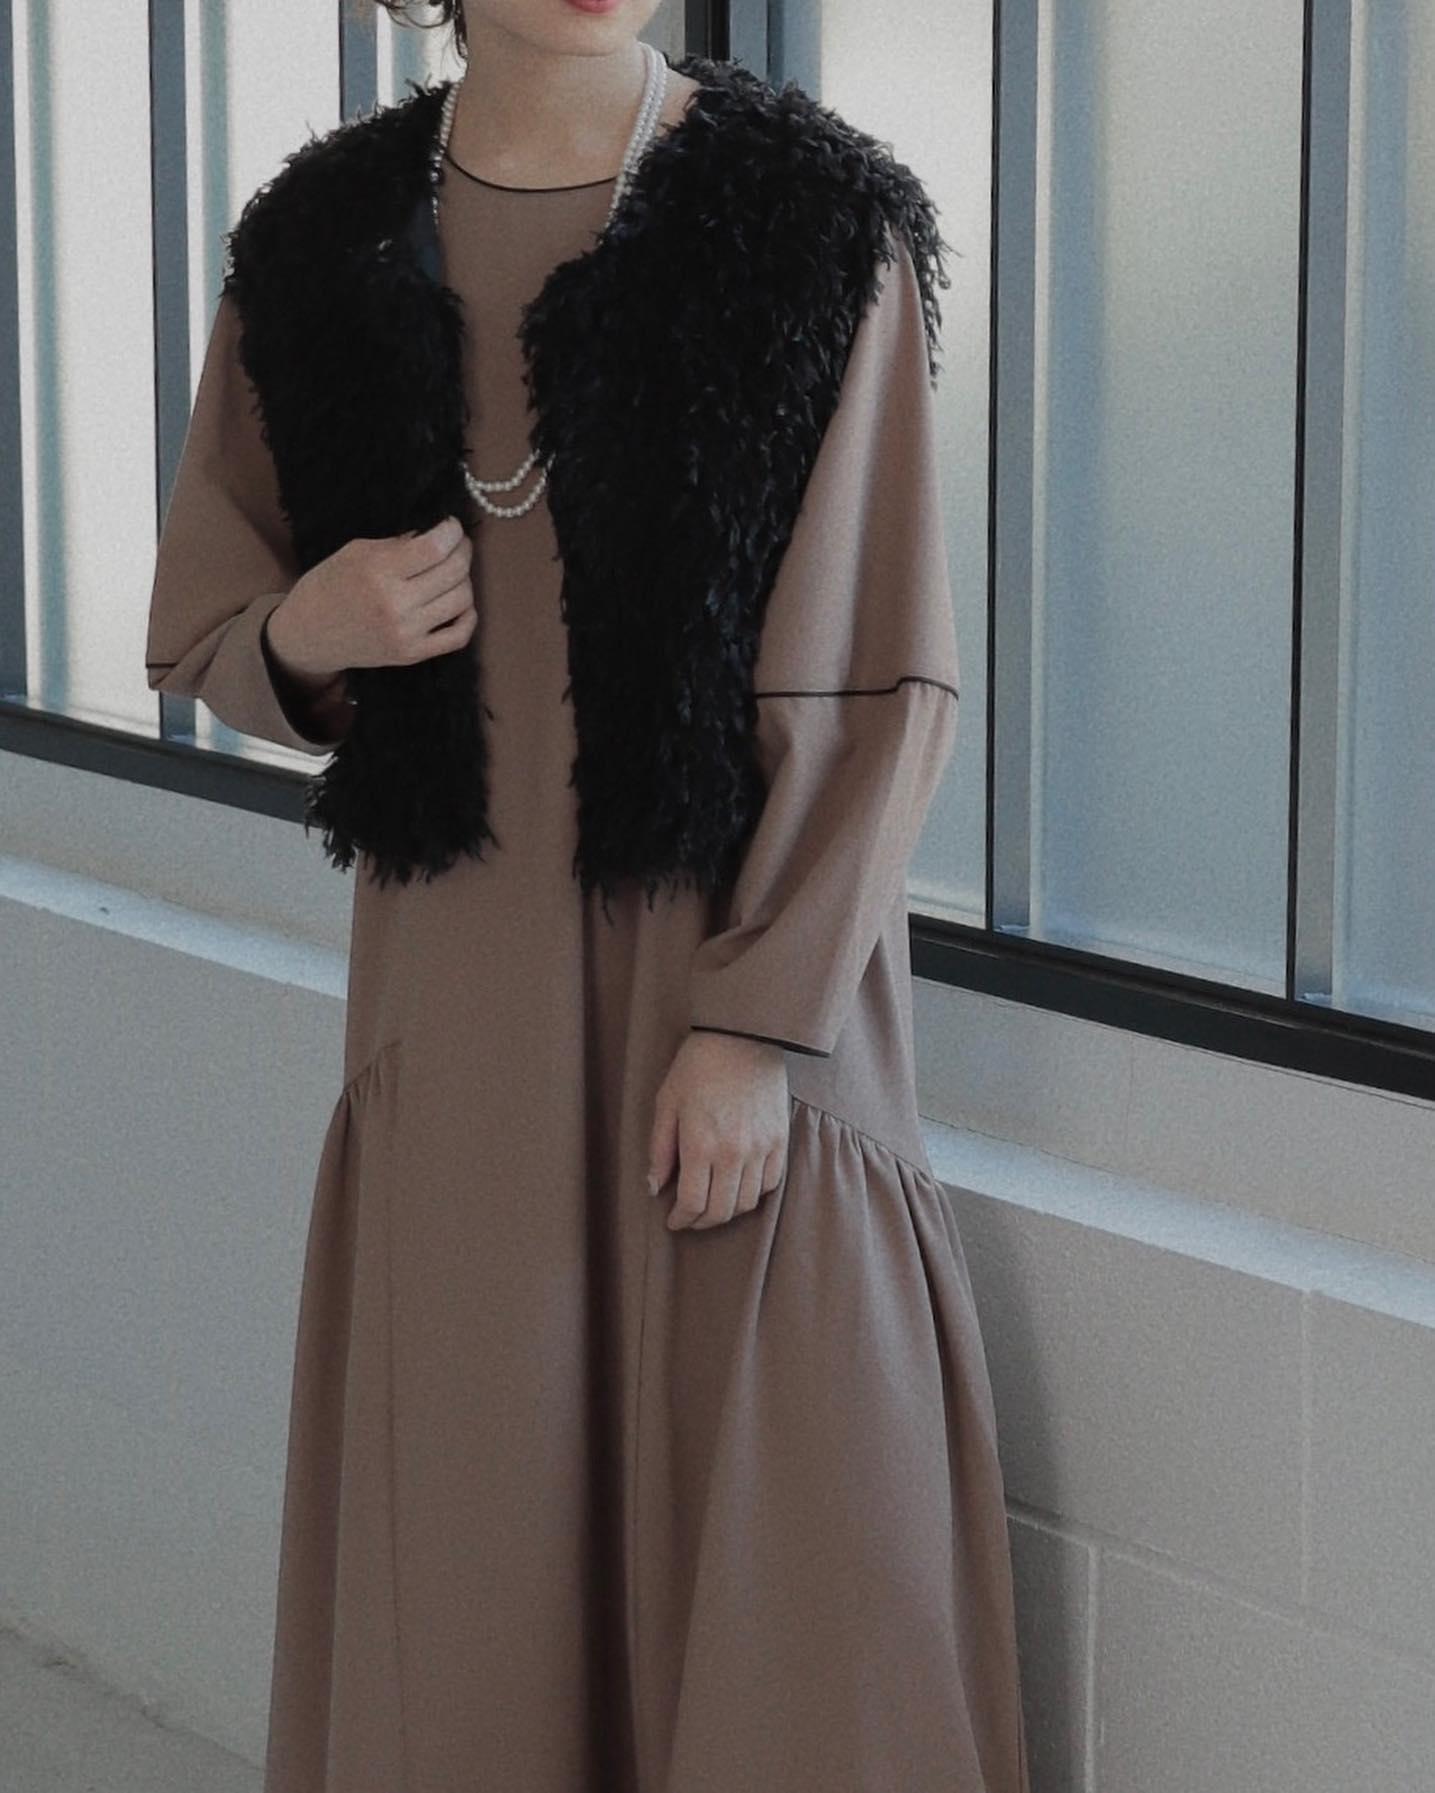 .︎フェザーライクショートベスト ¥5,390︎パイピングワンピース ¥6,490取り扱い店舗、オンラインにて現在販売中です。#ur_melty #urmelty #ユアメルティ #ベスト #カラーベスト #フェザーベスト #ベストコーデ #パイピングワンピース #ワンピースコーデ #韓国っぽ #韓国っぽコーデ #韓国ファッション #韓国風 #コリヨジャ #オトジョ #大人女子 #オトジョコーデ #오오티디 #데일리룩 #패션 #패션스타그램 #옷스타그램 #일본패션 #유아멜티 #코디 #코디스타그램